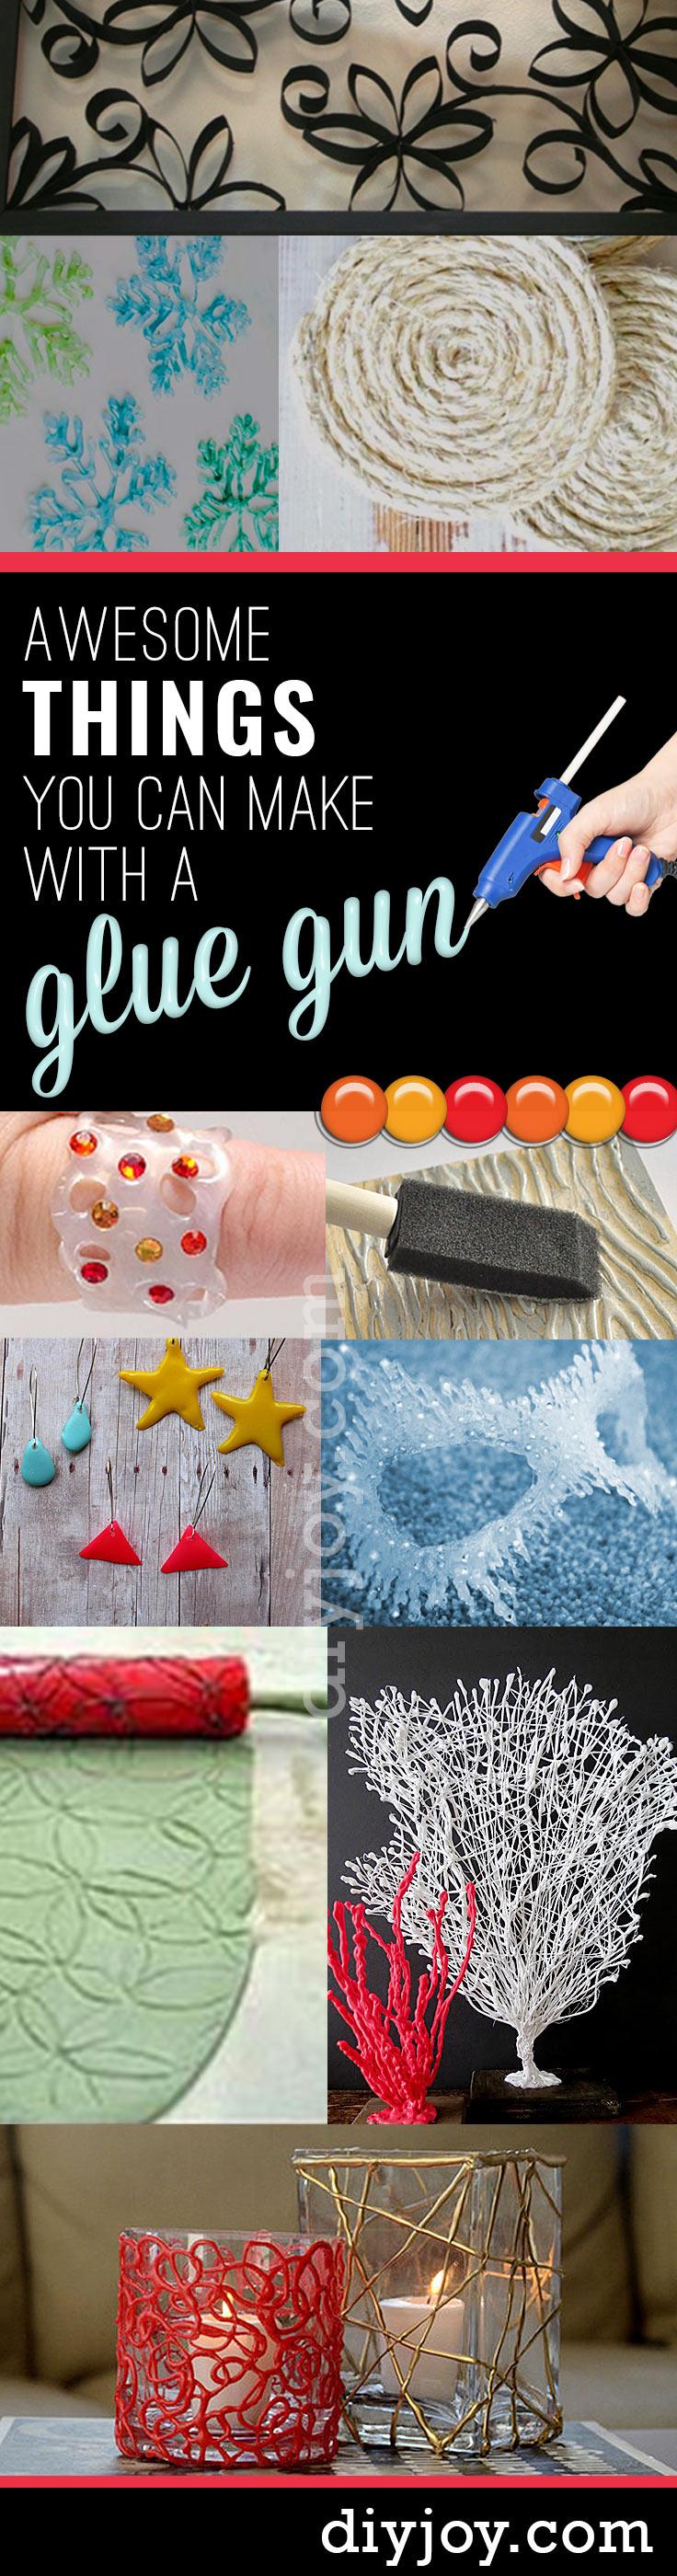 Hot Glue Gun Crafts - Best Hot Glue Gun DIY Crafts, DIY Projects and Arts and Crafts Ideas Using Glue Gun Sticks #diy #crafts #gluegun